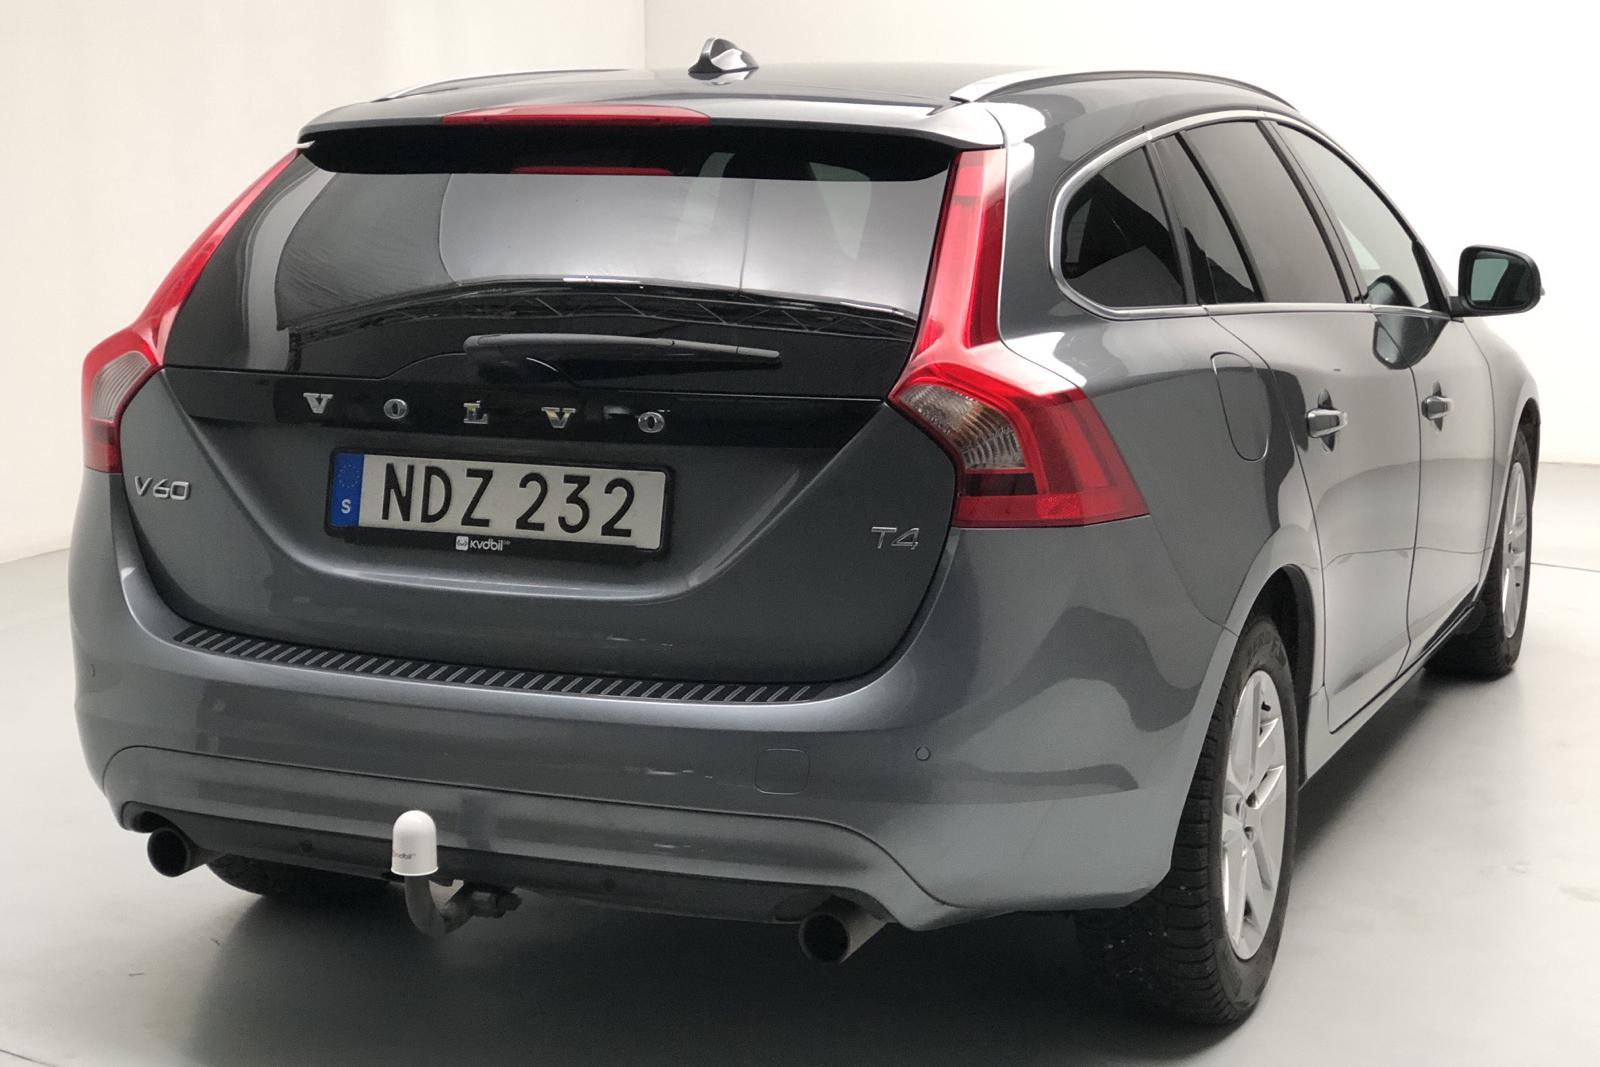 Volvo V60 T4 (190hk) - 7 800 mil - Automat - grå - 2016